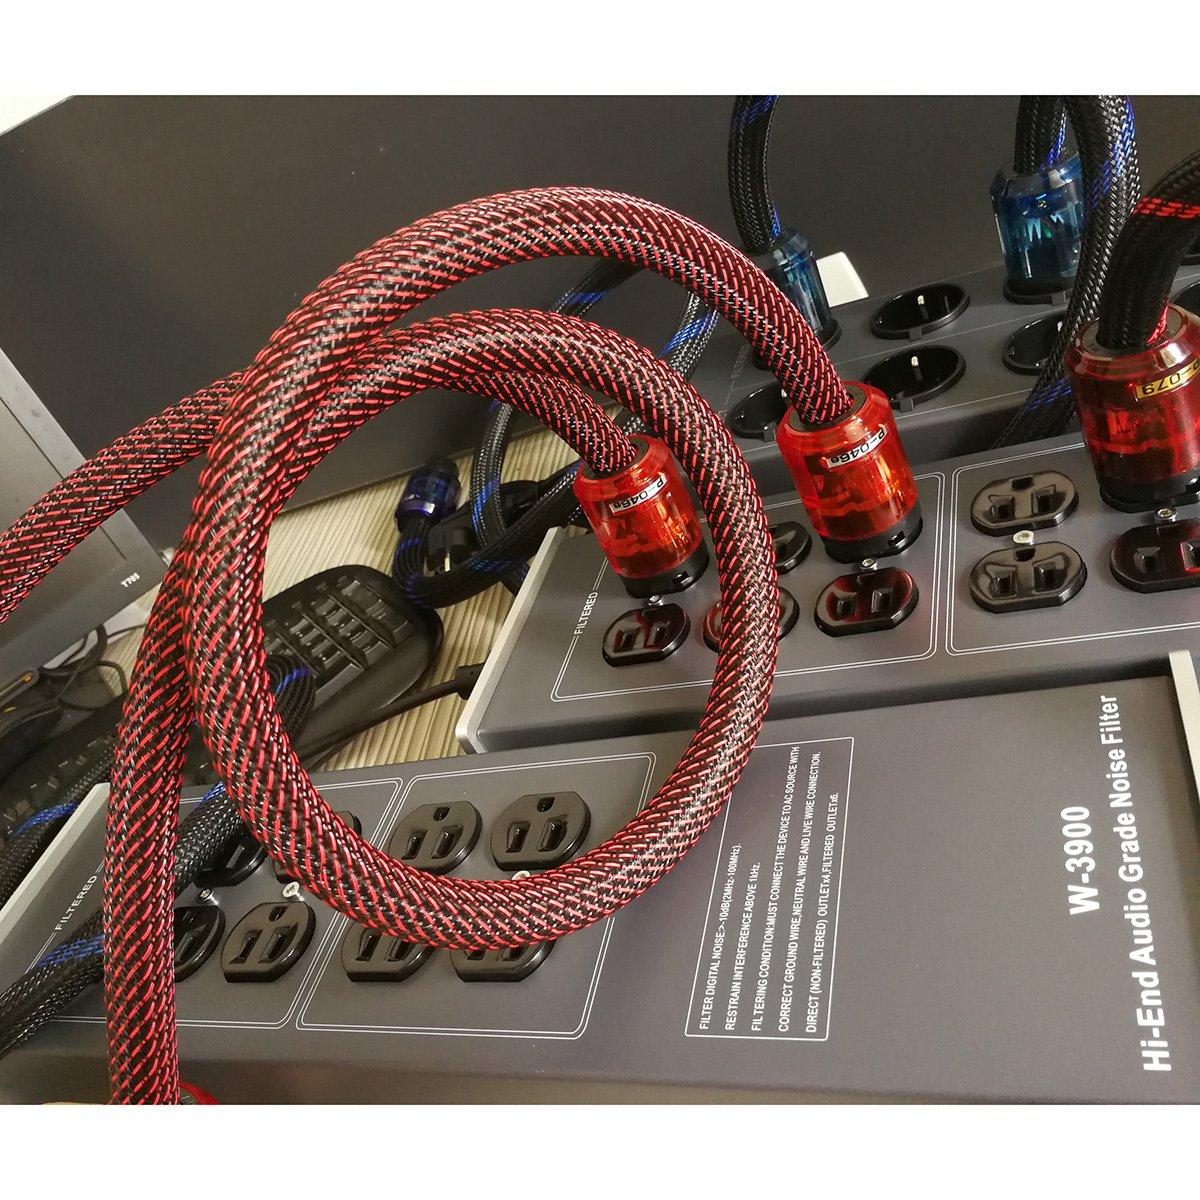 WAudio Hi-End Hifi Audio AC Power Cable Power Cord US Plug - 3.3FT (1M) by WAudio (Image #7)